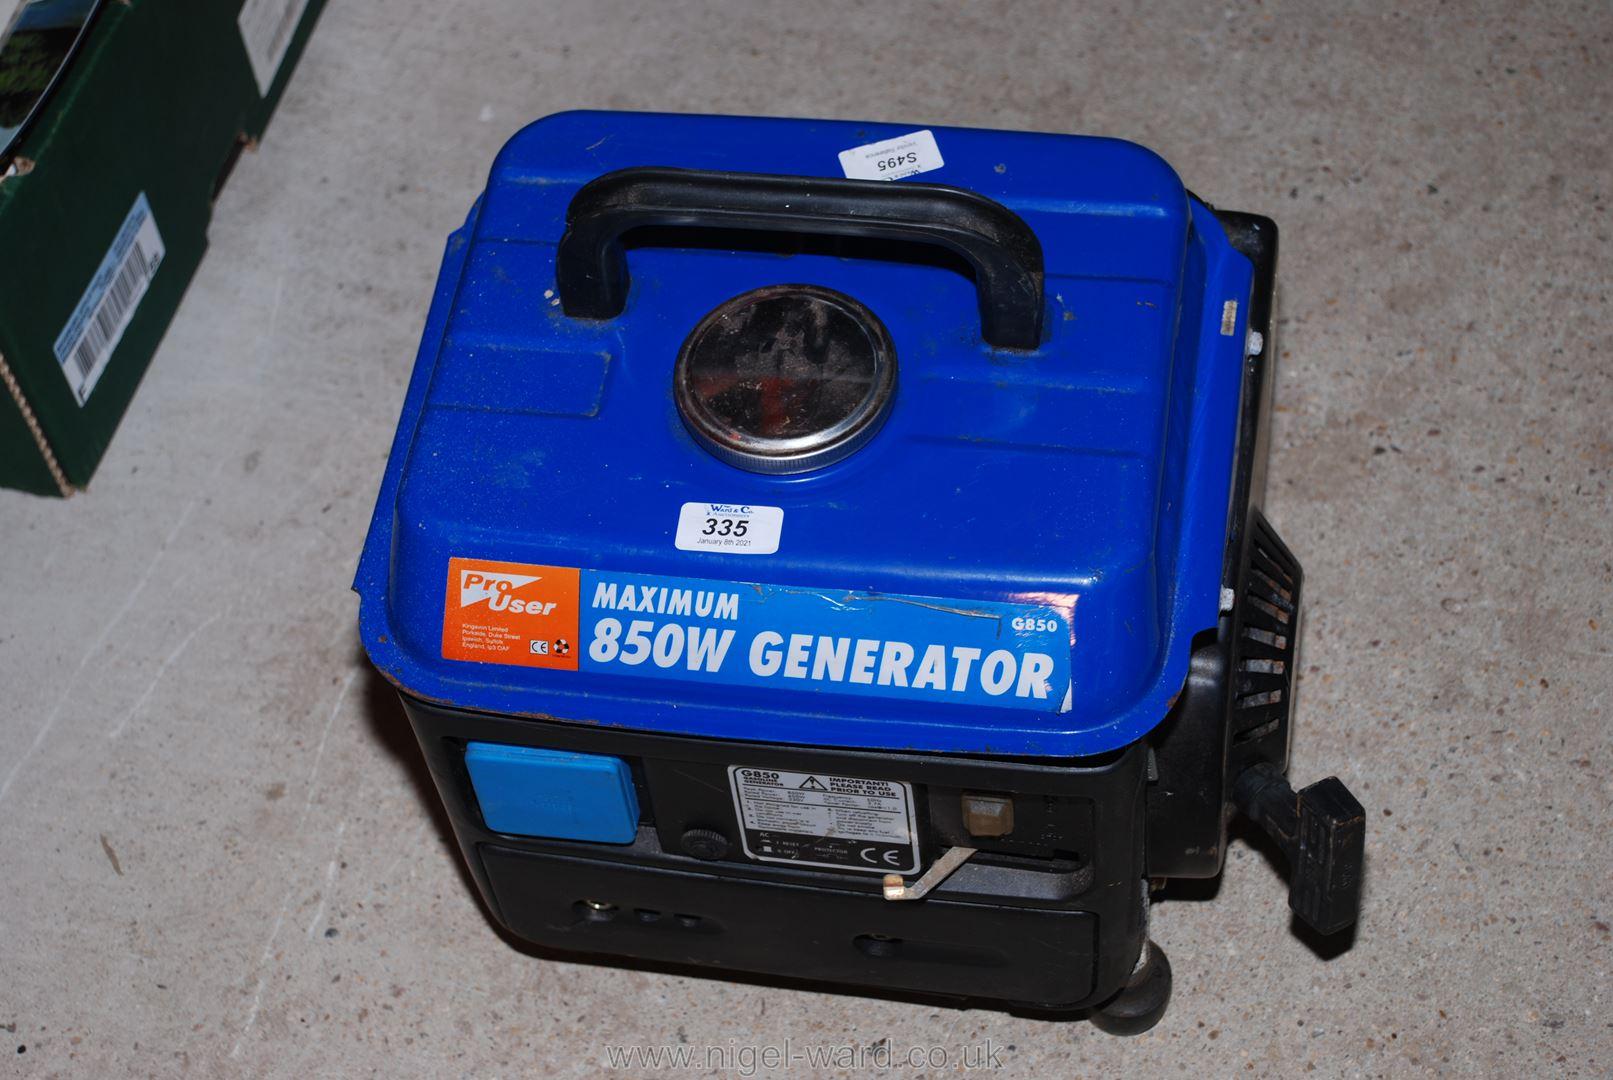 An 850w petrol generator.